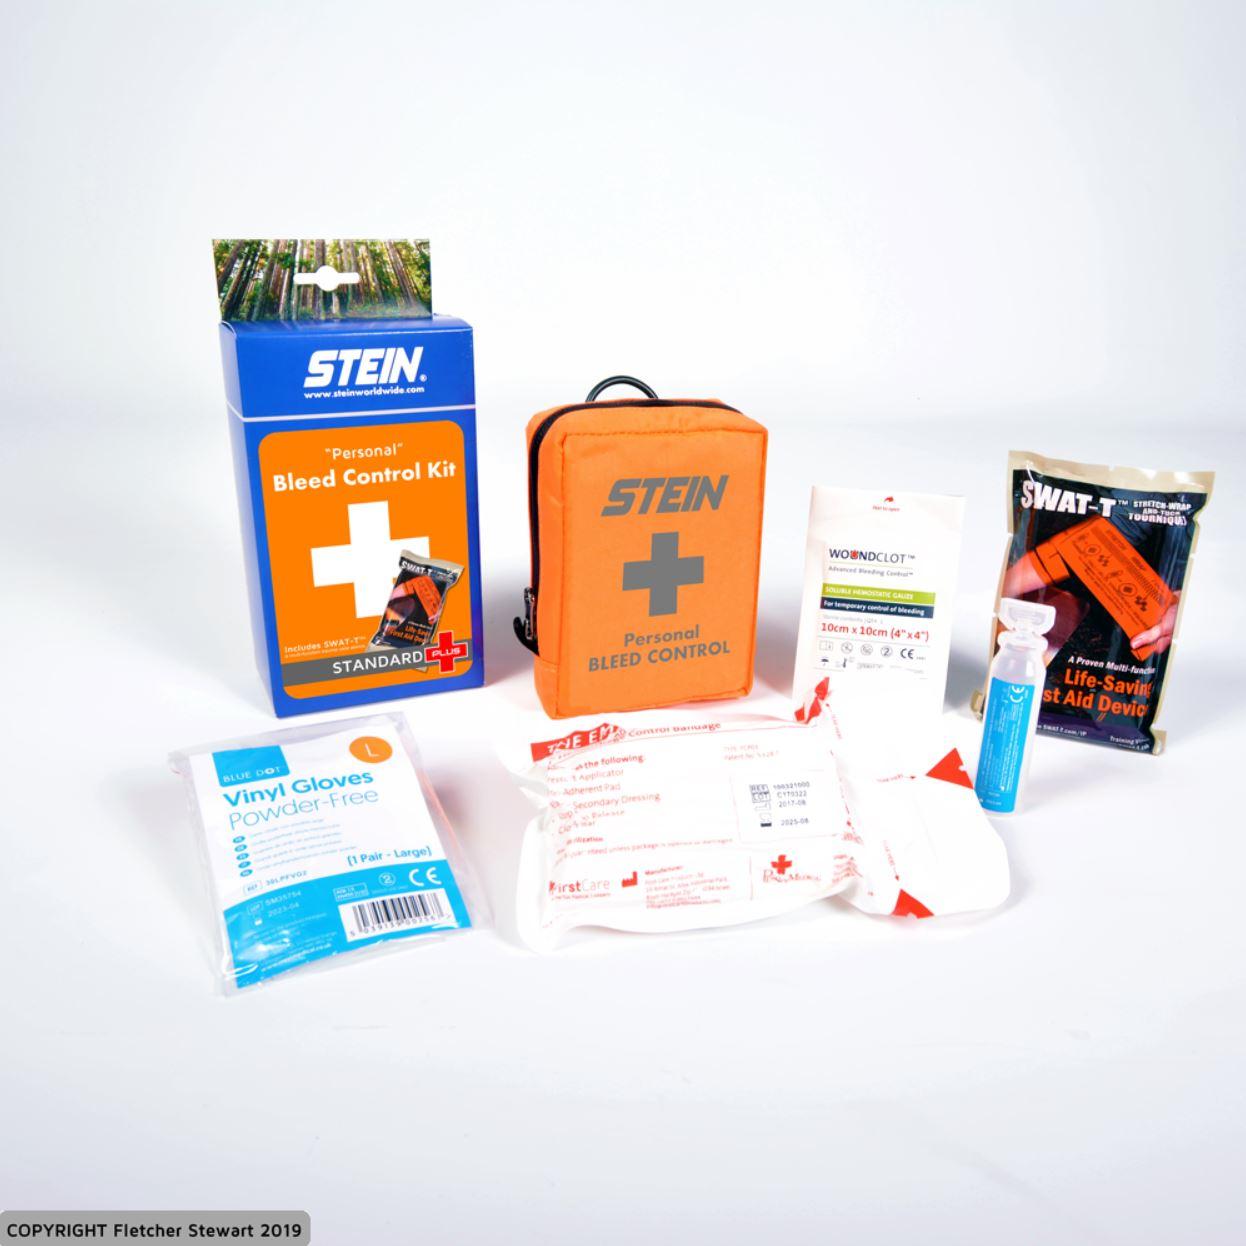 "Stein Personal ""Bleed Control Kit"" (Standard Plus)"